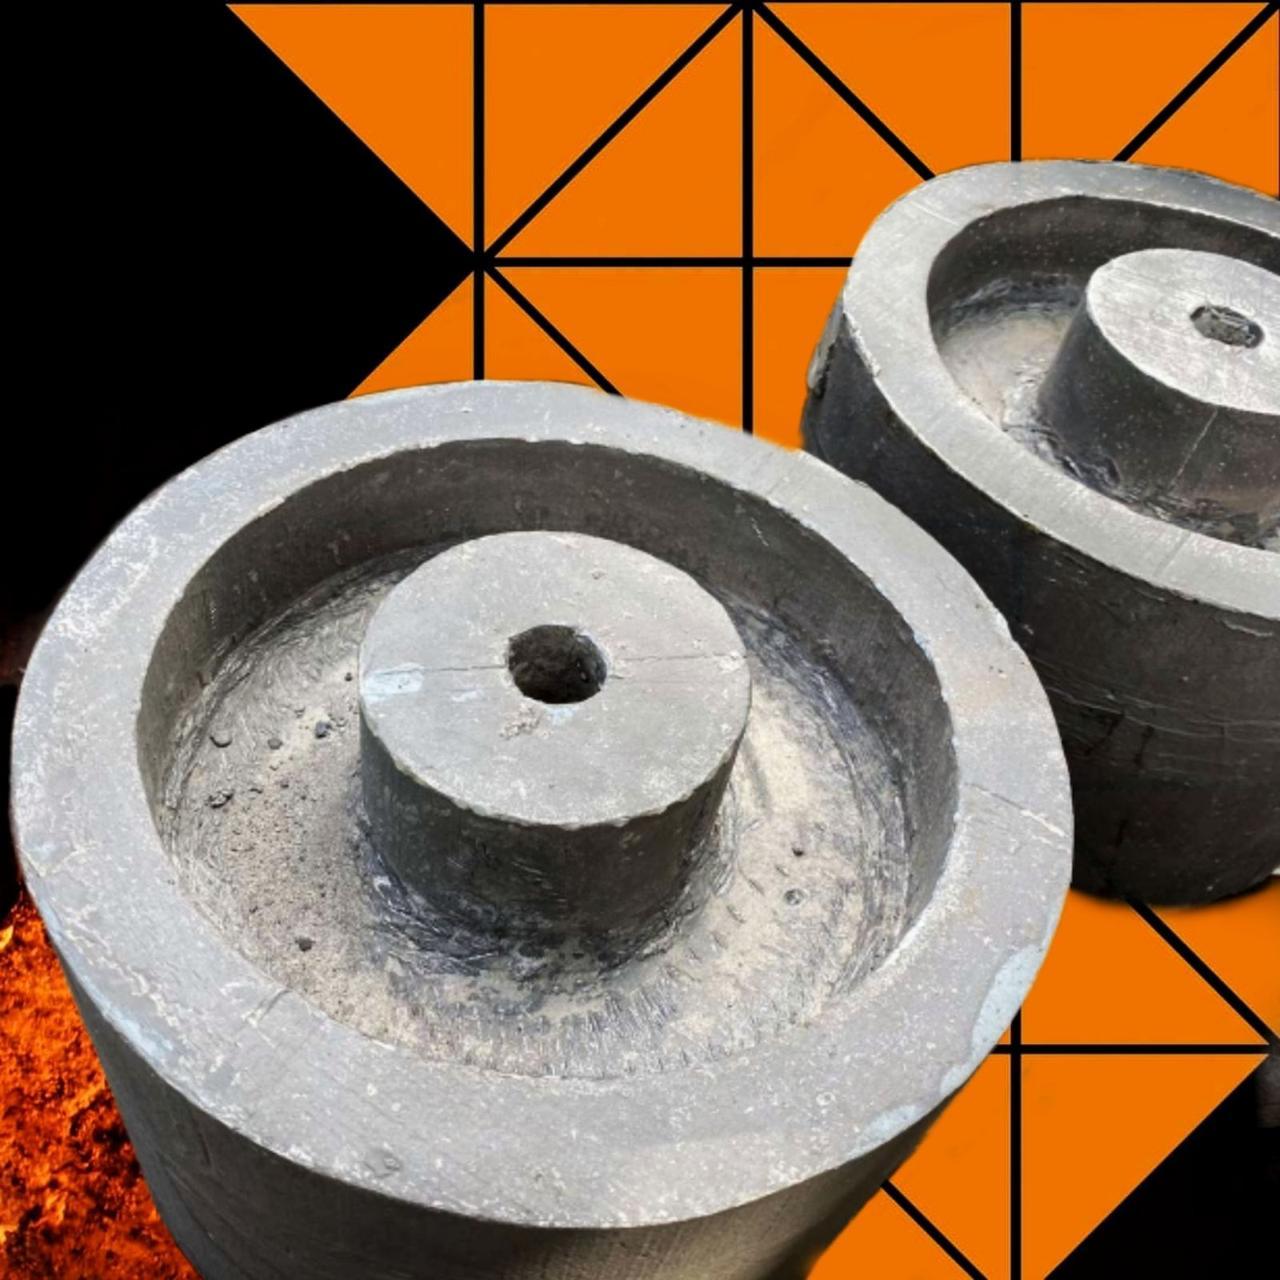 Металлургическое литейное предприятие предлагает сотрудничество